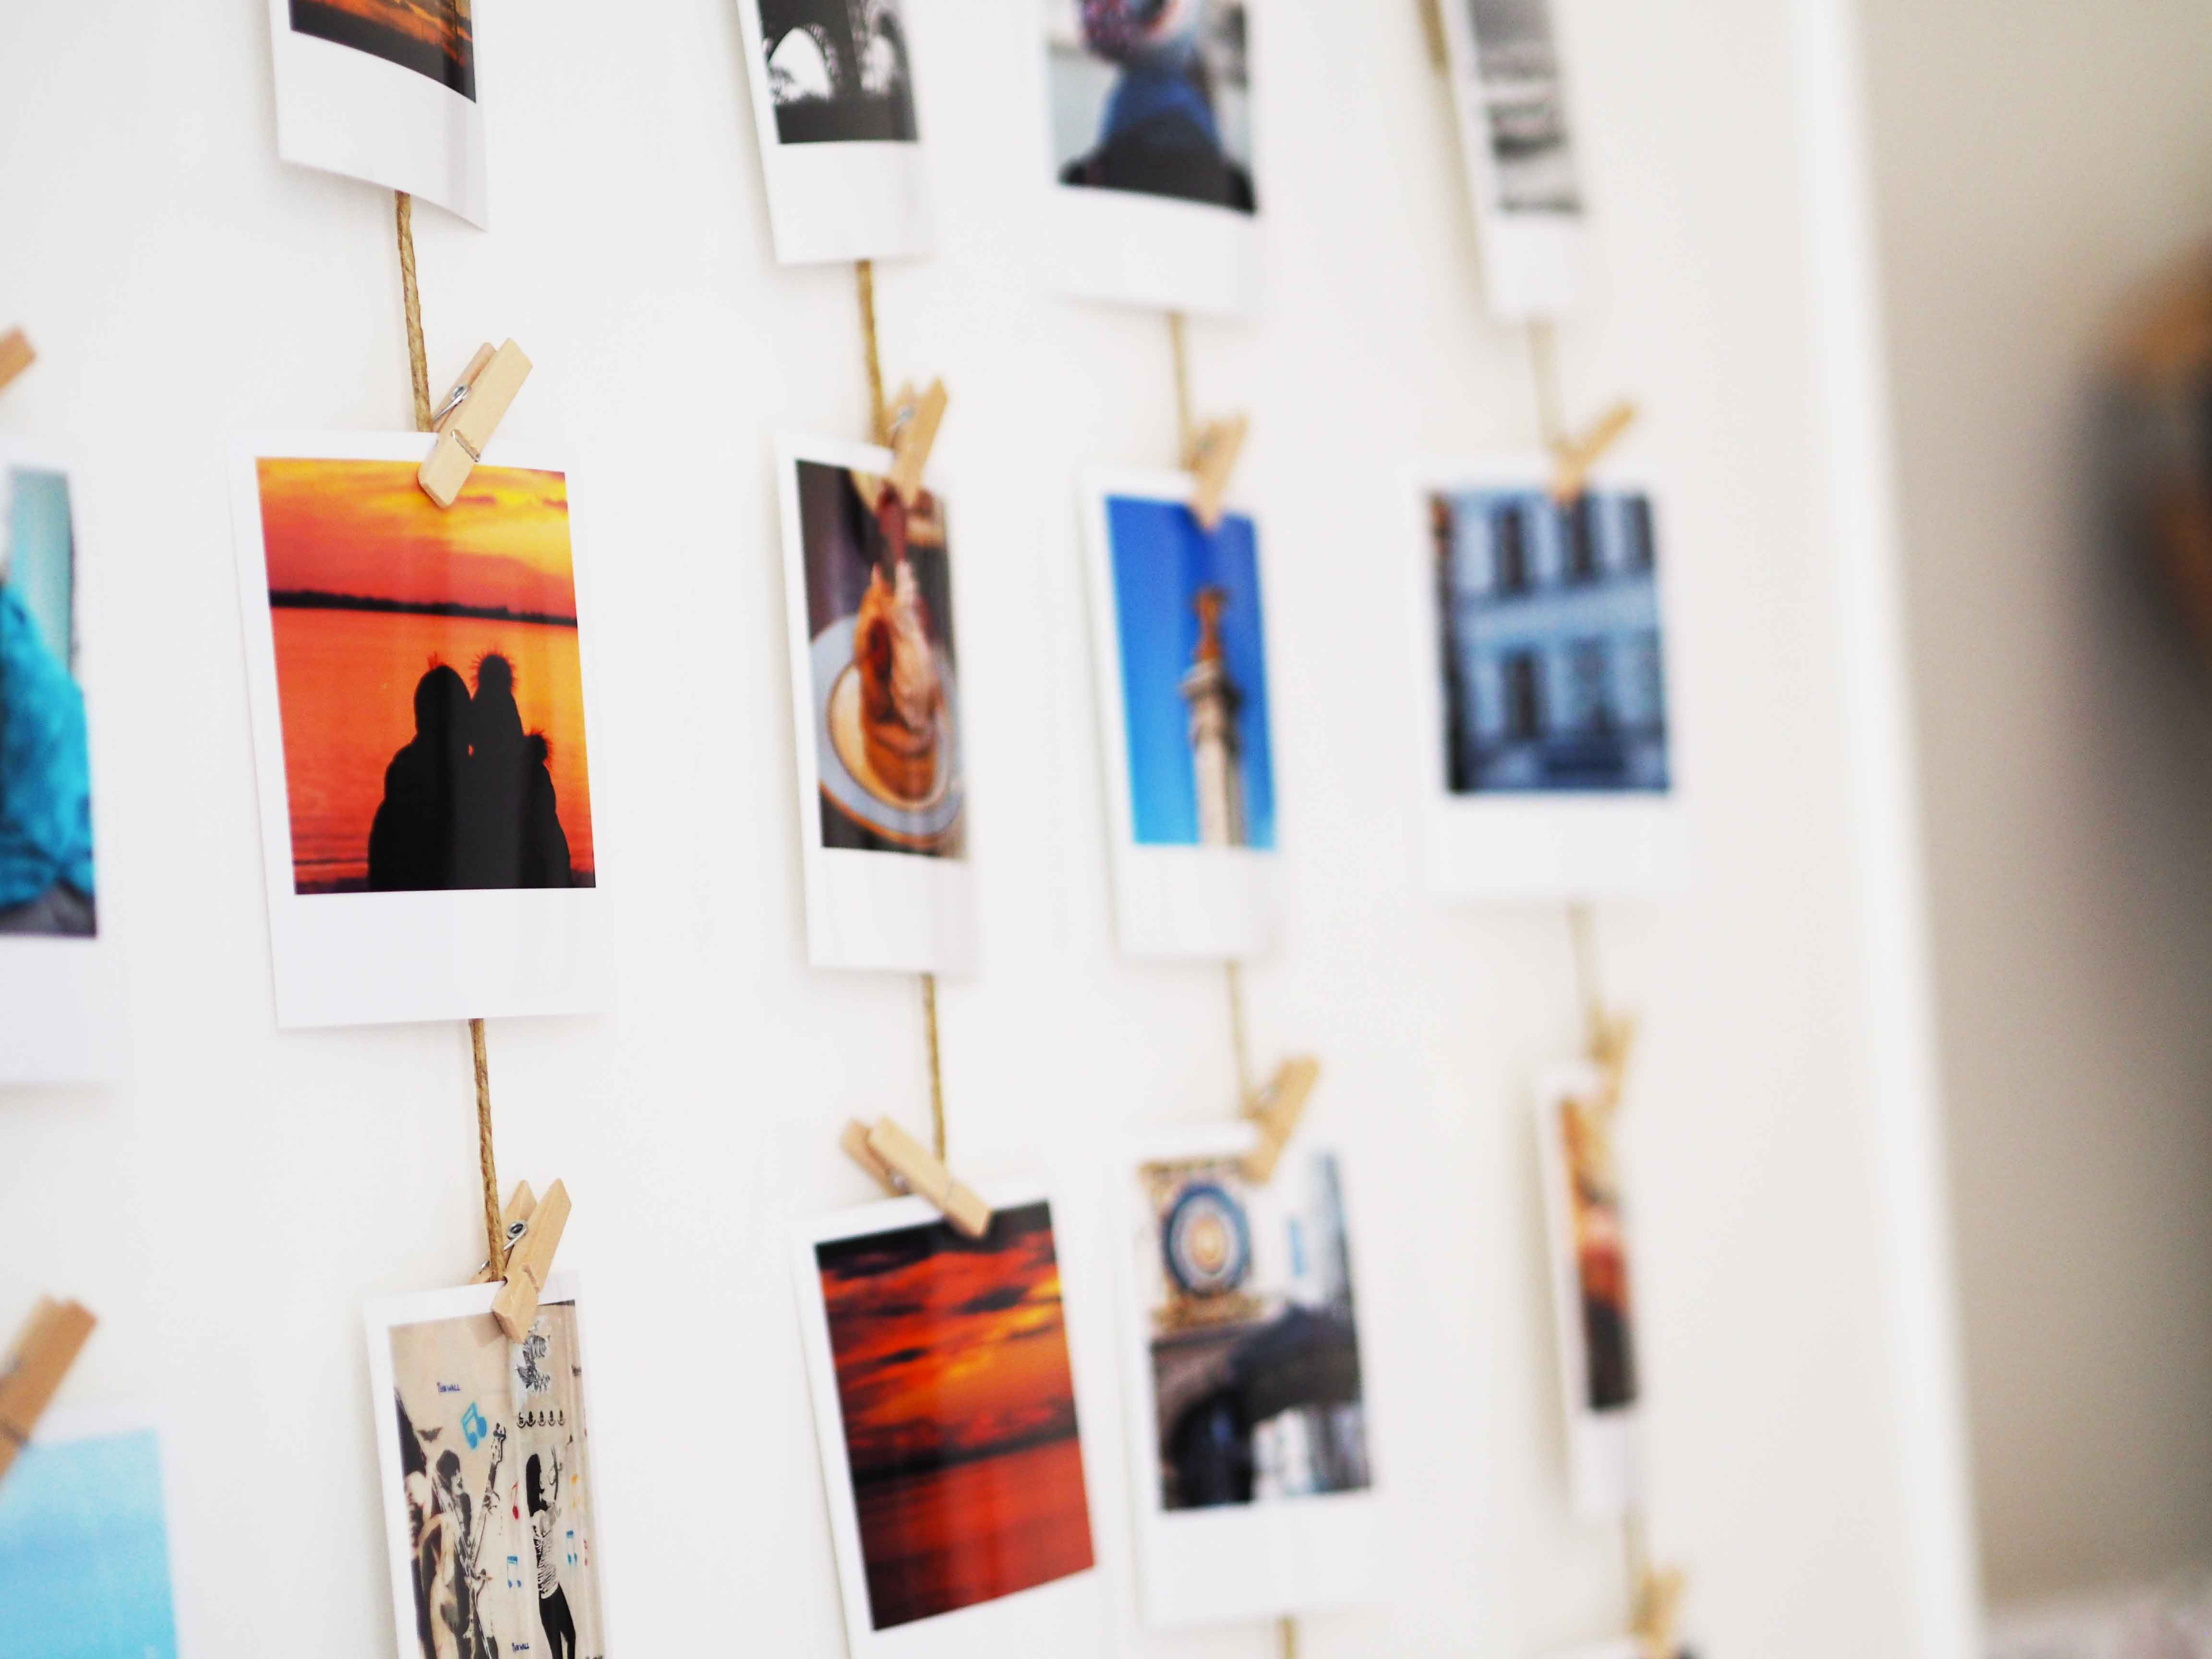 Diy comment accrocher ses photos polaro d like a bobo - Accrocher toile au mur ...